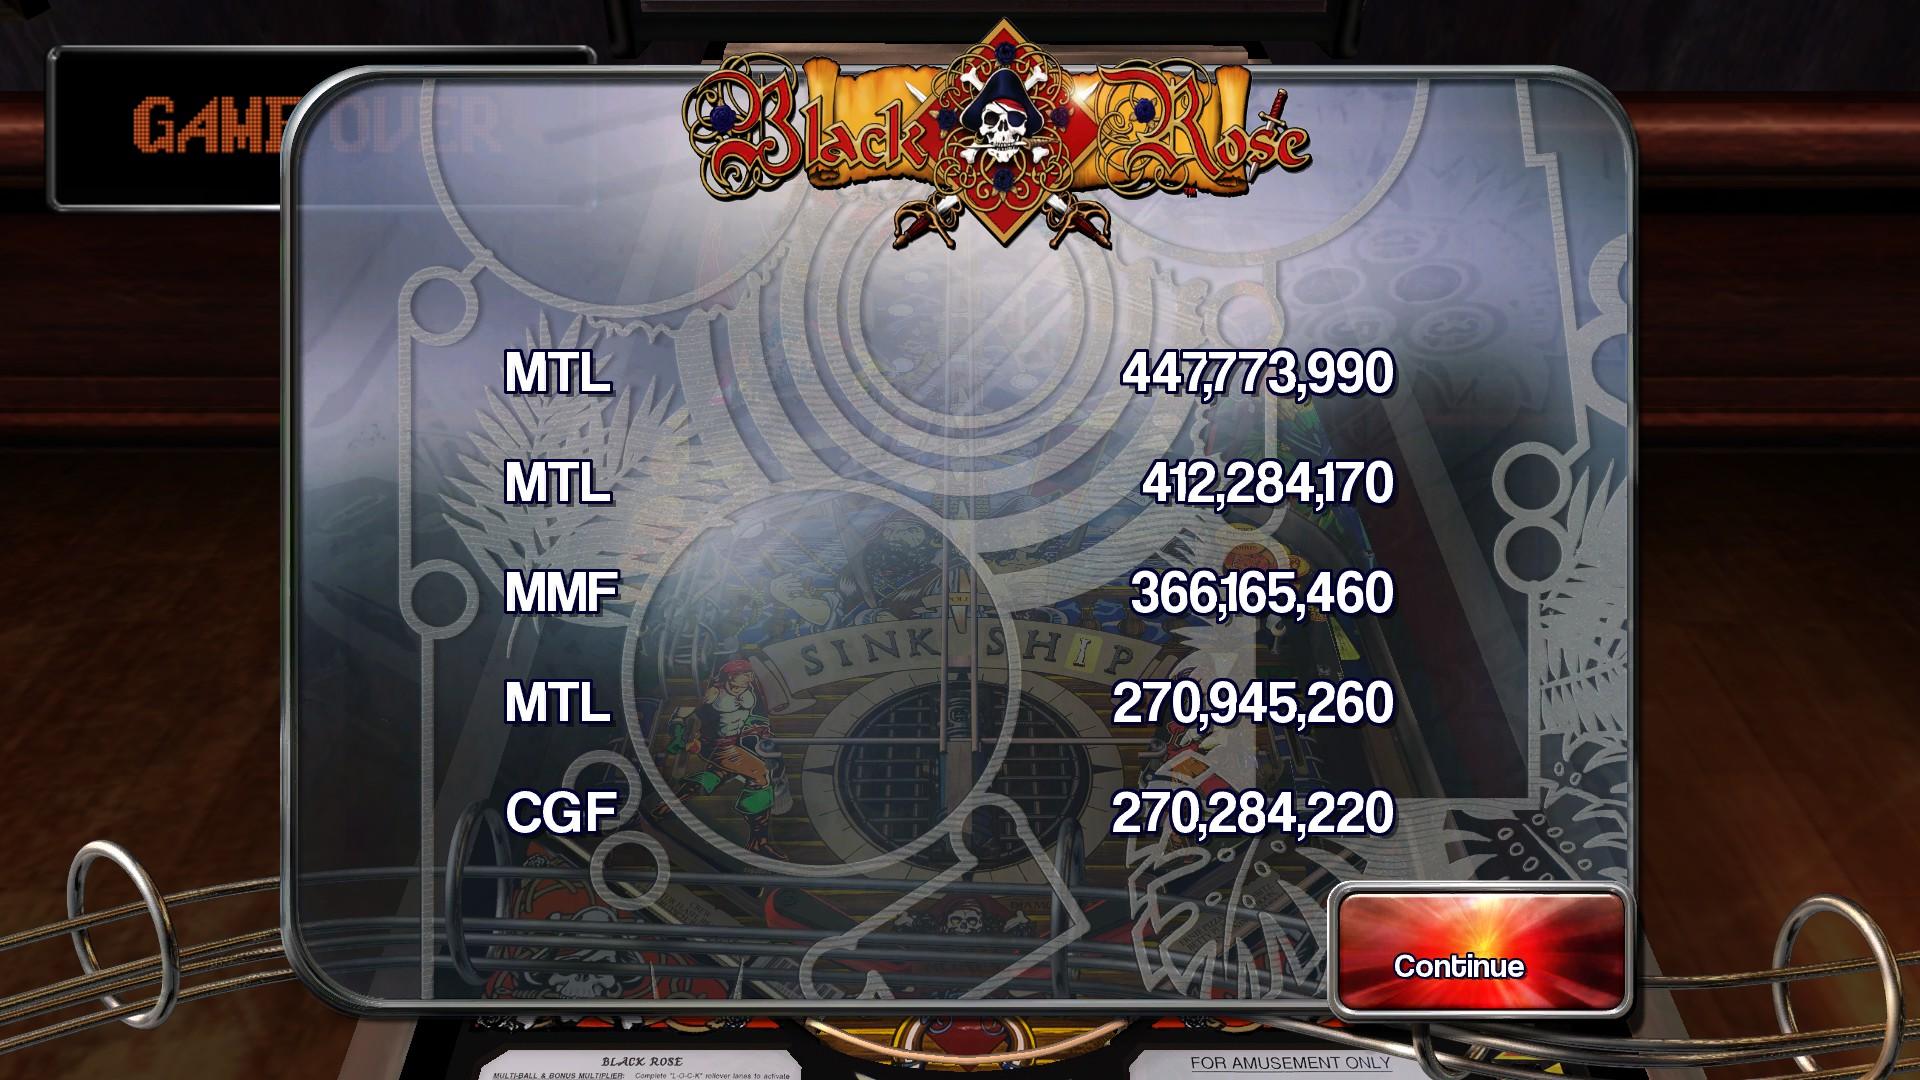 Mantalow: Pinball Arcade: Black Rose (PC) 447,773,990 points on 2016-05-23 11:29:49